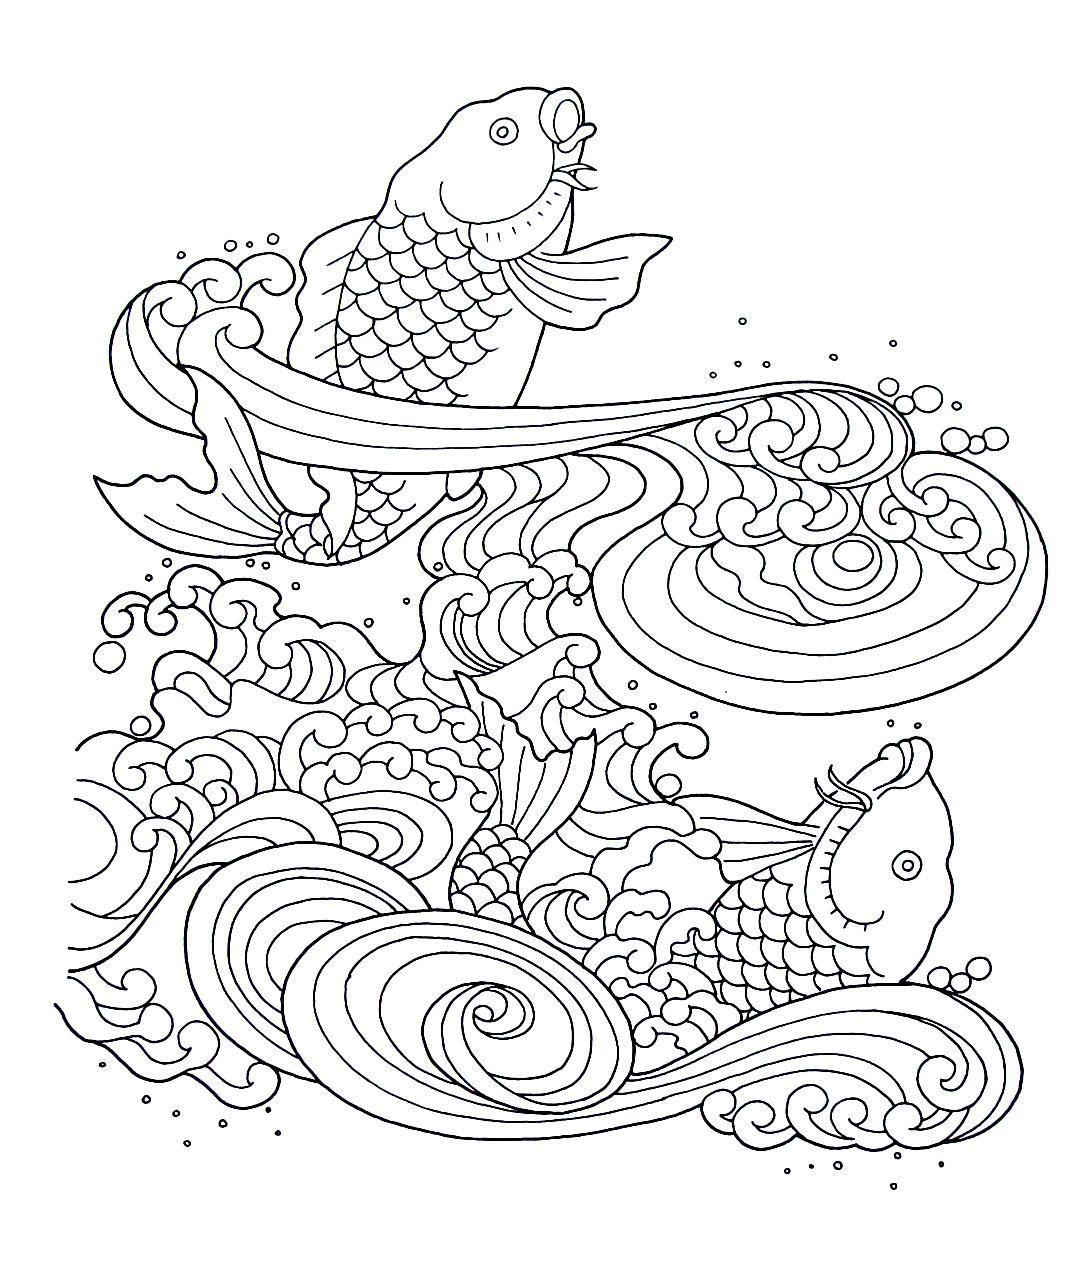 Carp And A Wave Morif